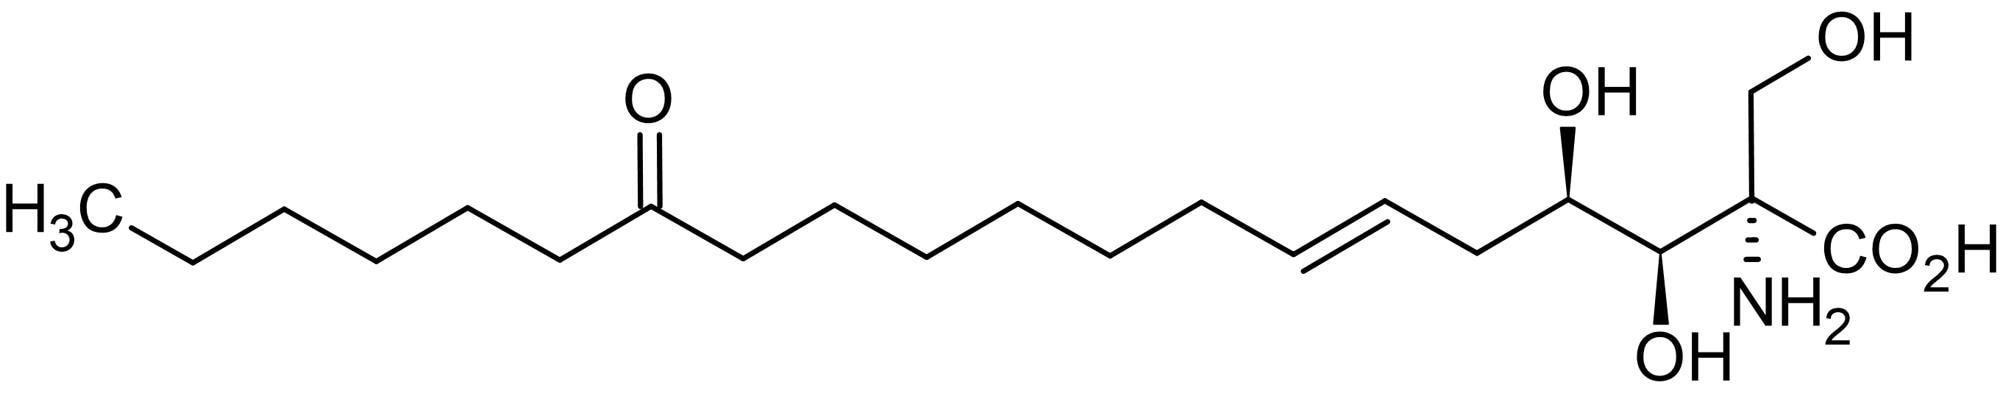 Chemical Structure - Myriocin (ISP-I), serine palmitoyltransferase inhibitor (ab143526)